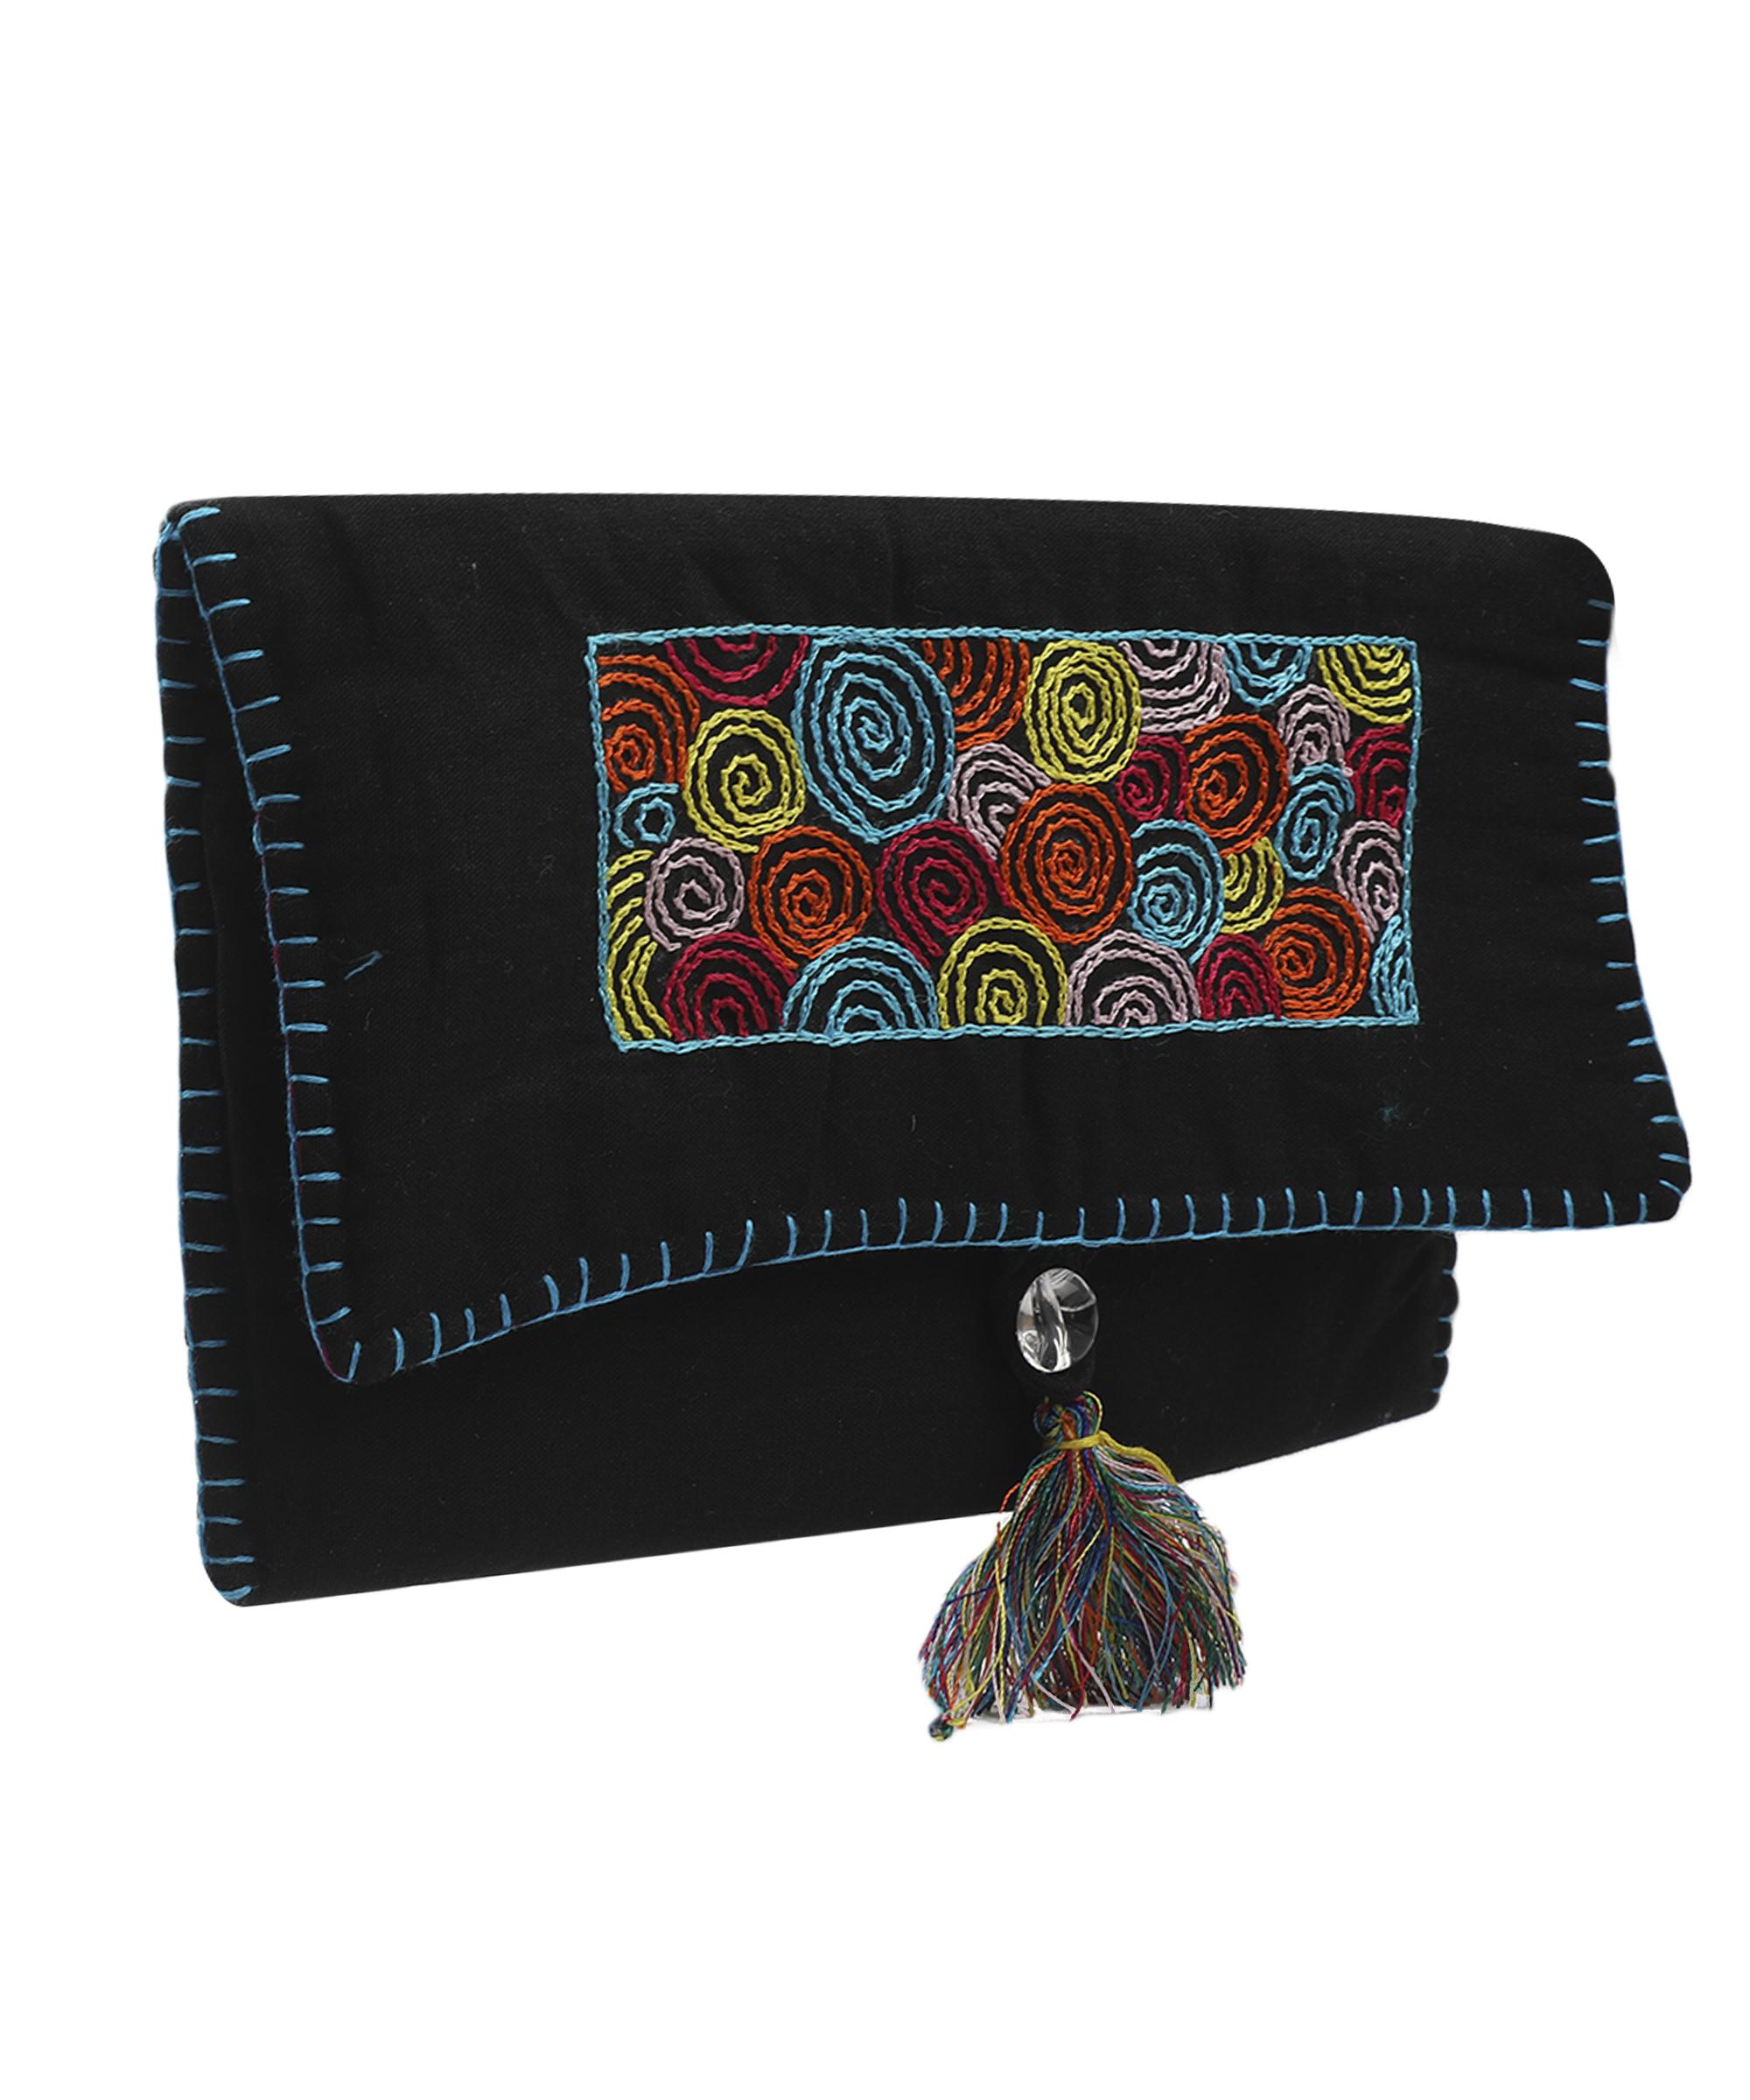 Women's Embroidered Clutch, Poplin Cotton Fabric (Spiral - Black)